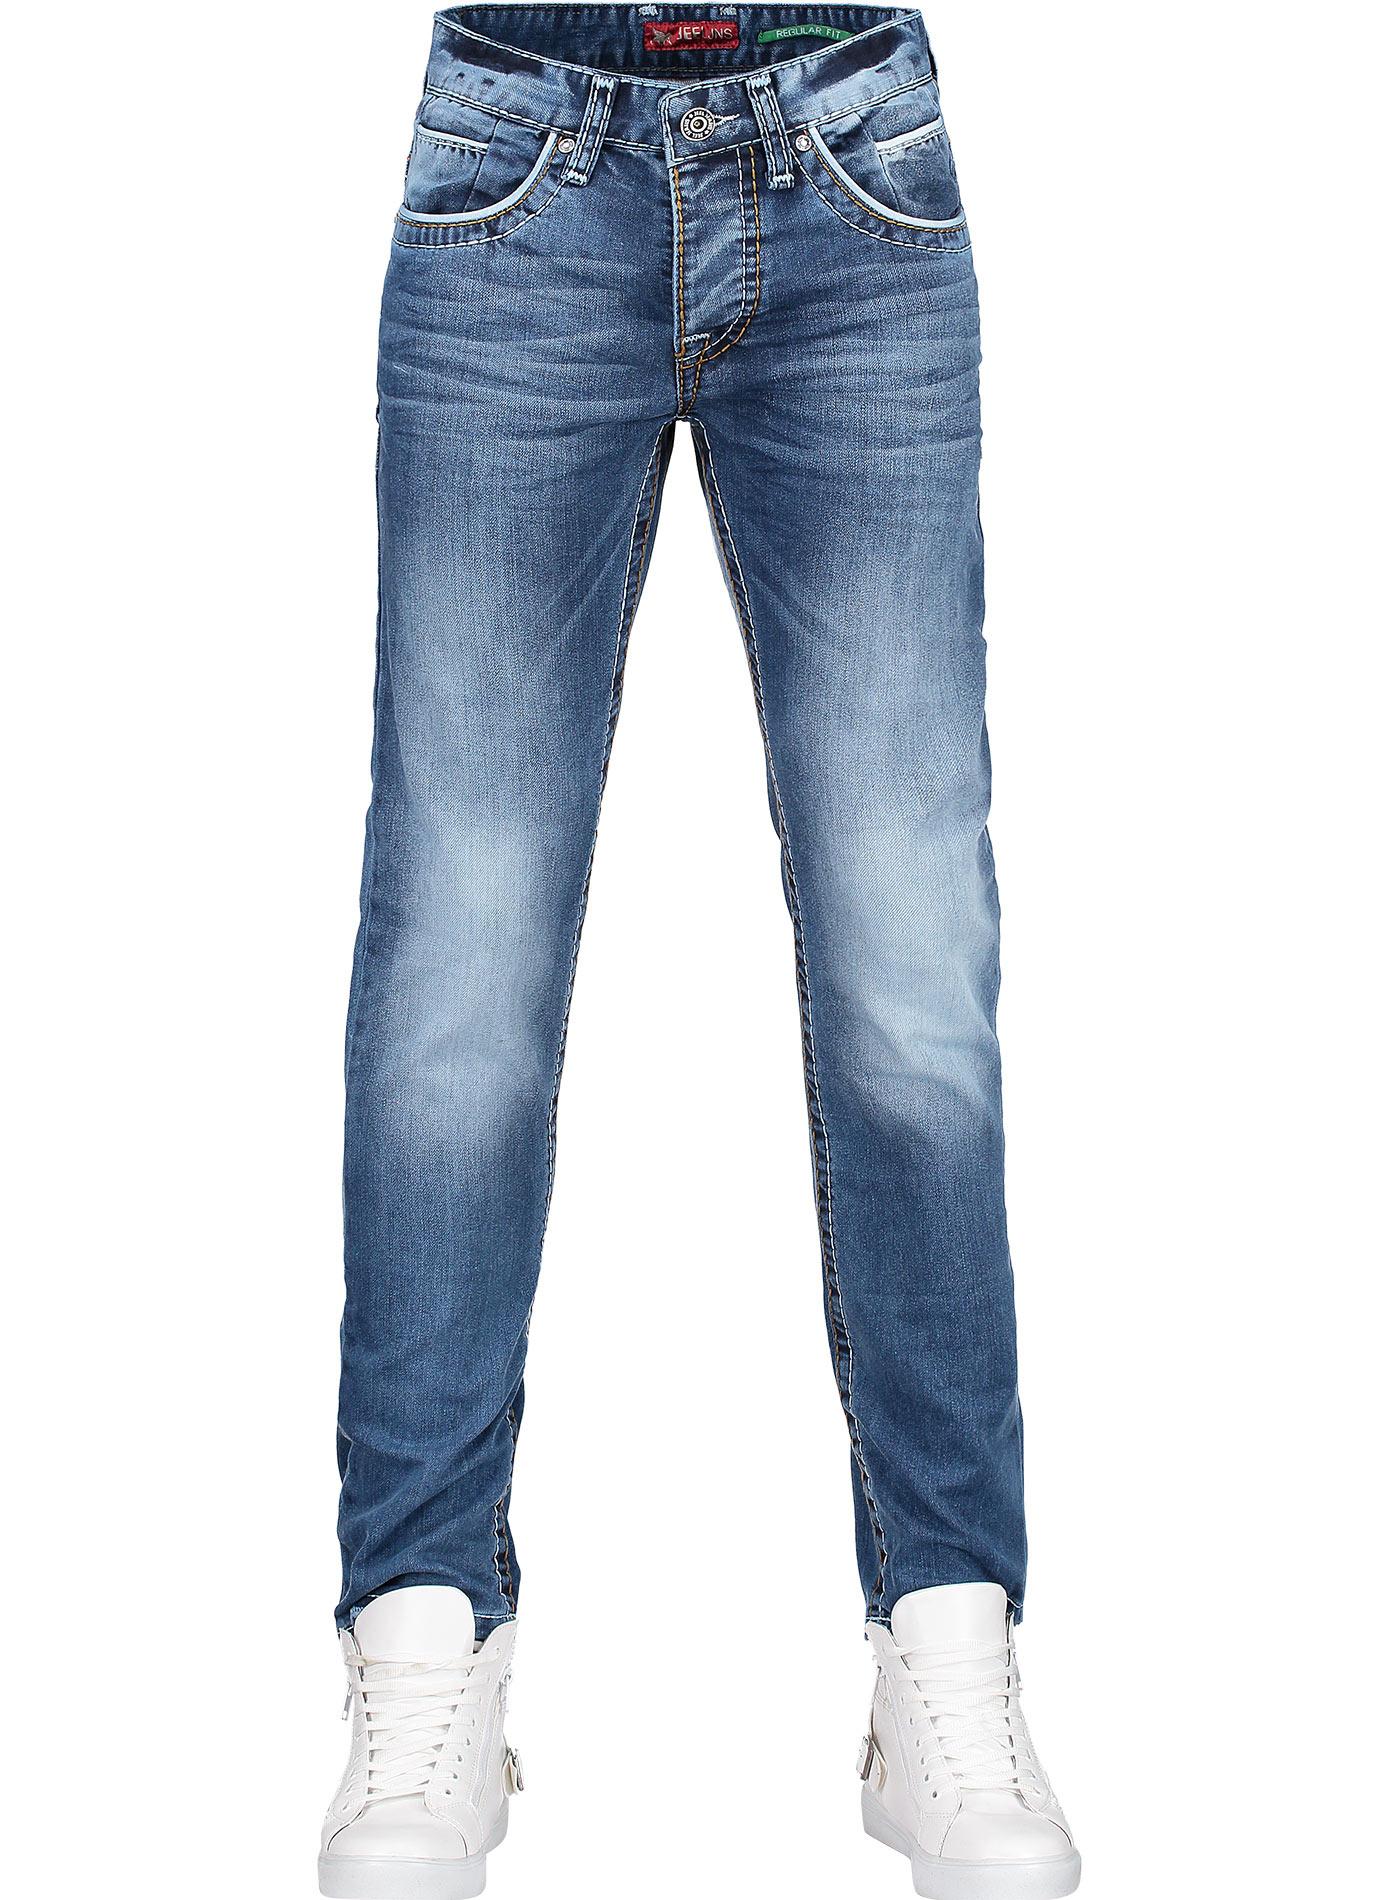 Jeans Donker-Blauw